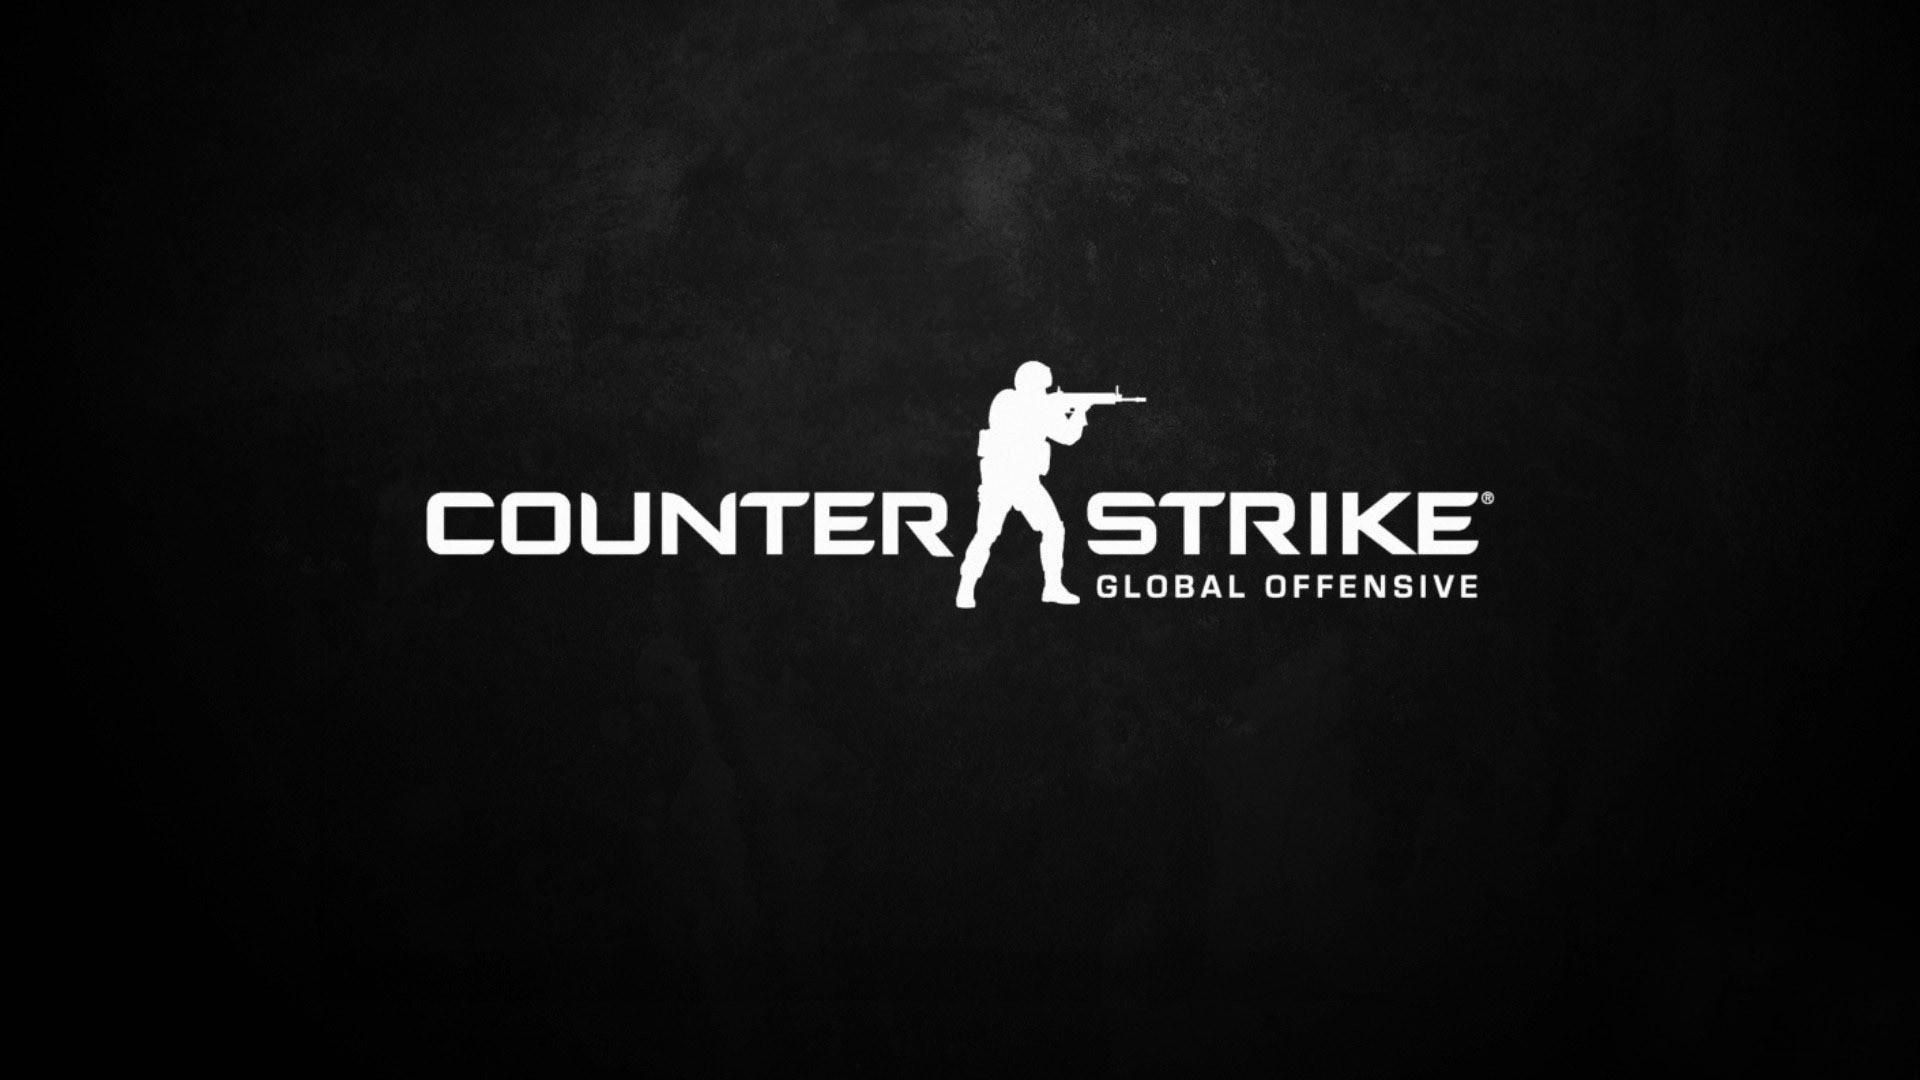 counter-strike-logo-game-hd-wallpaper-1920×1080-8945